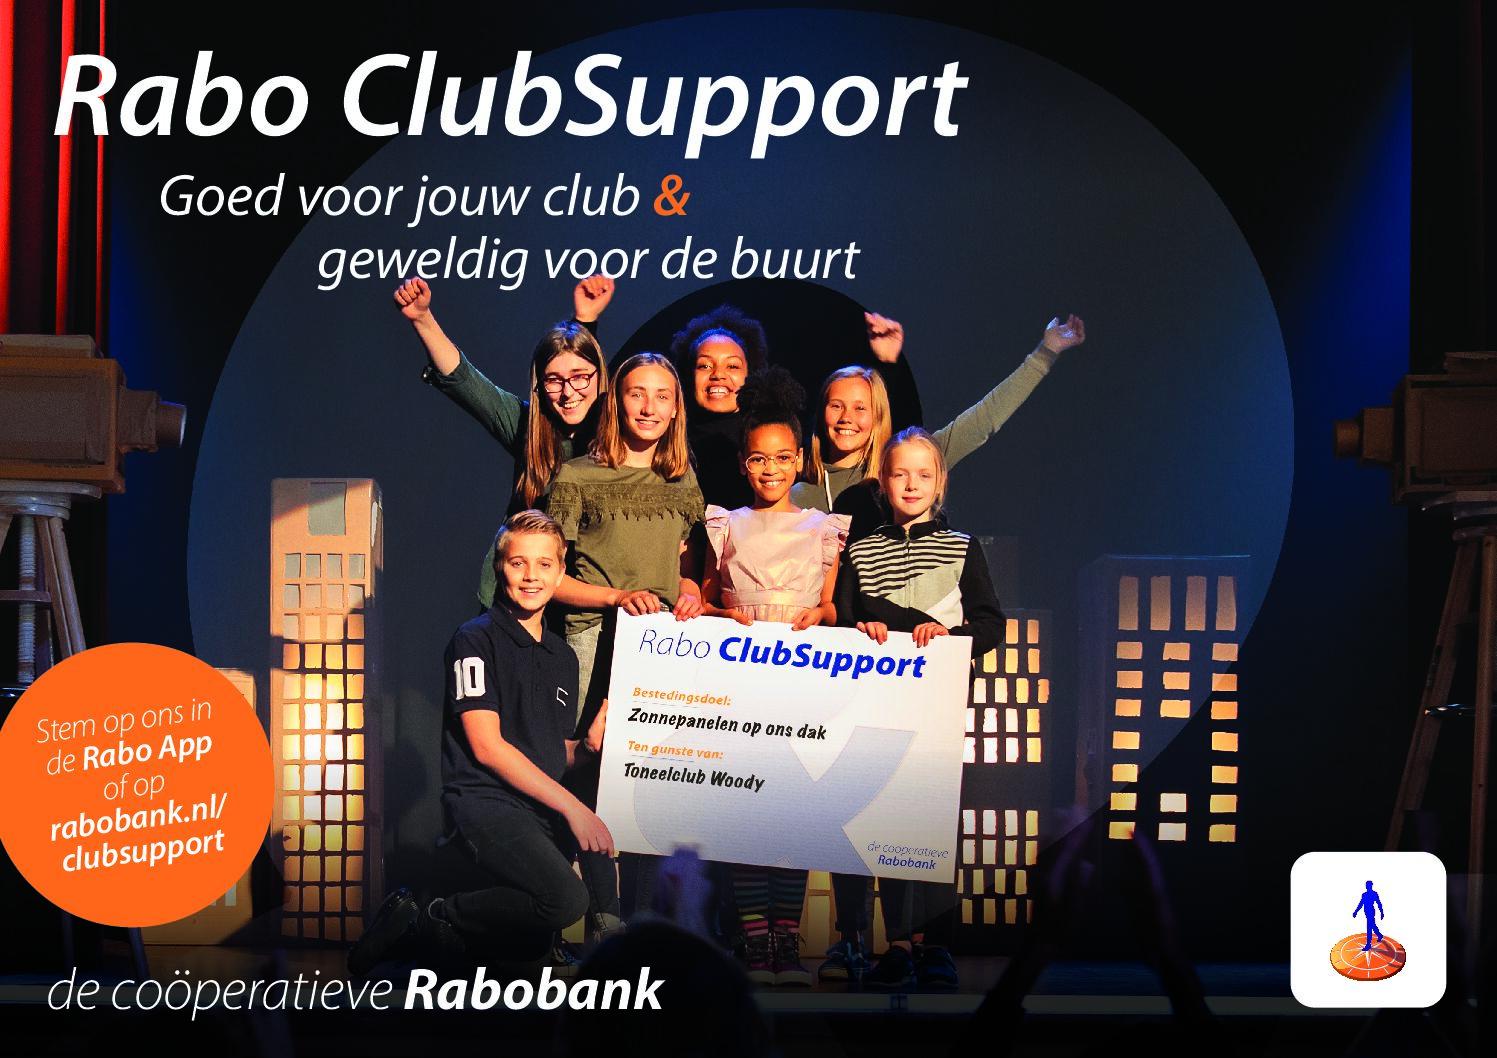 Rabo ClubSupport: Steun onze fanfare en stem op ons